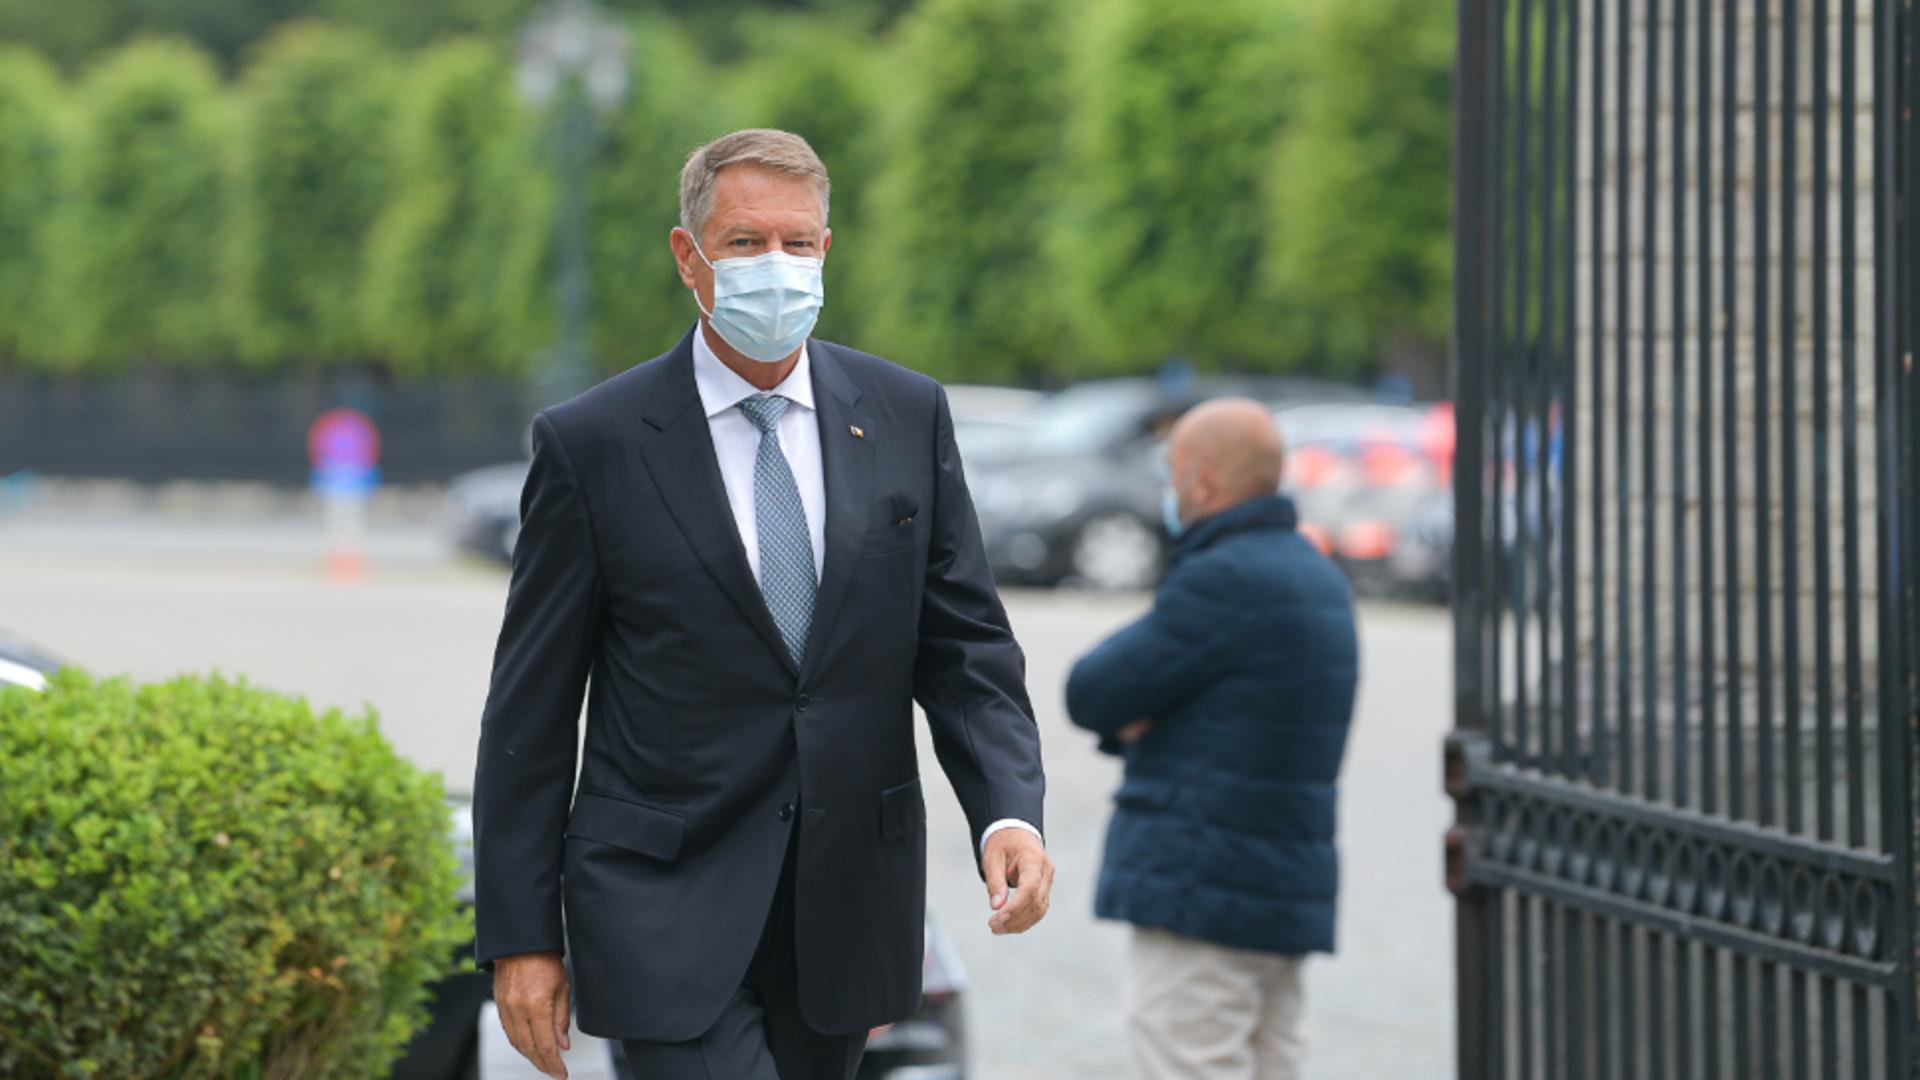 Președintele României, Klaus Iohannis / FOTO: Administrația Prezidențială